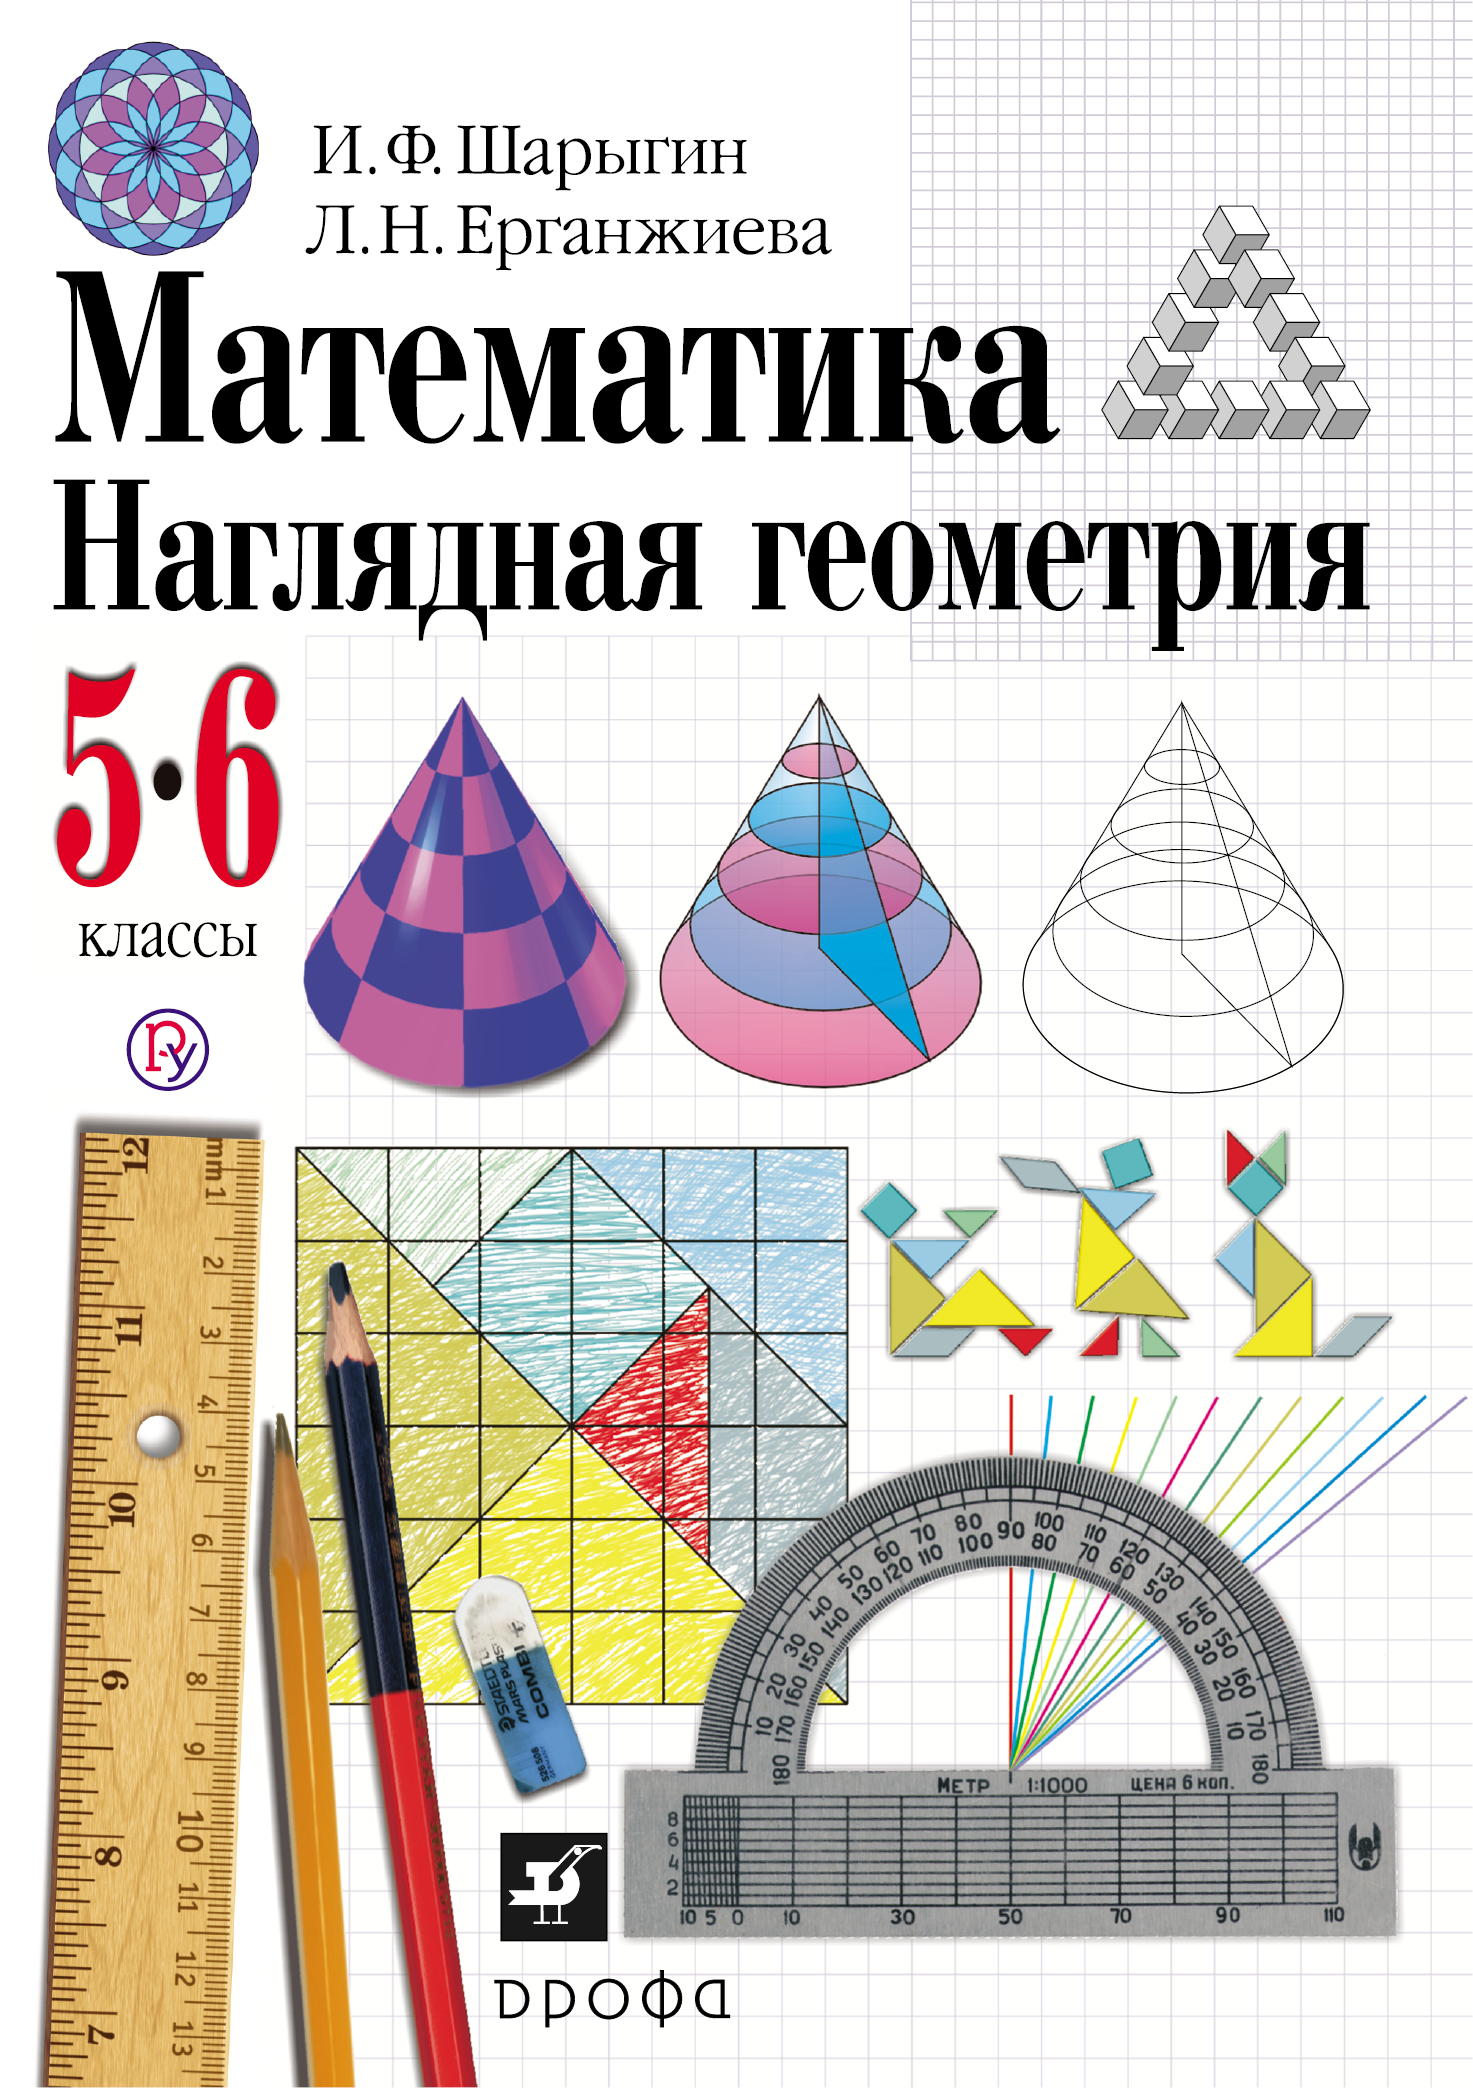 Онлайн гдз по геометрии 5-6 класс шарыгин ерганжиева